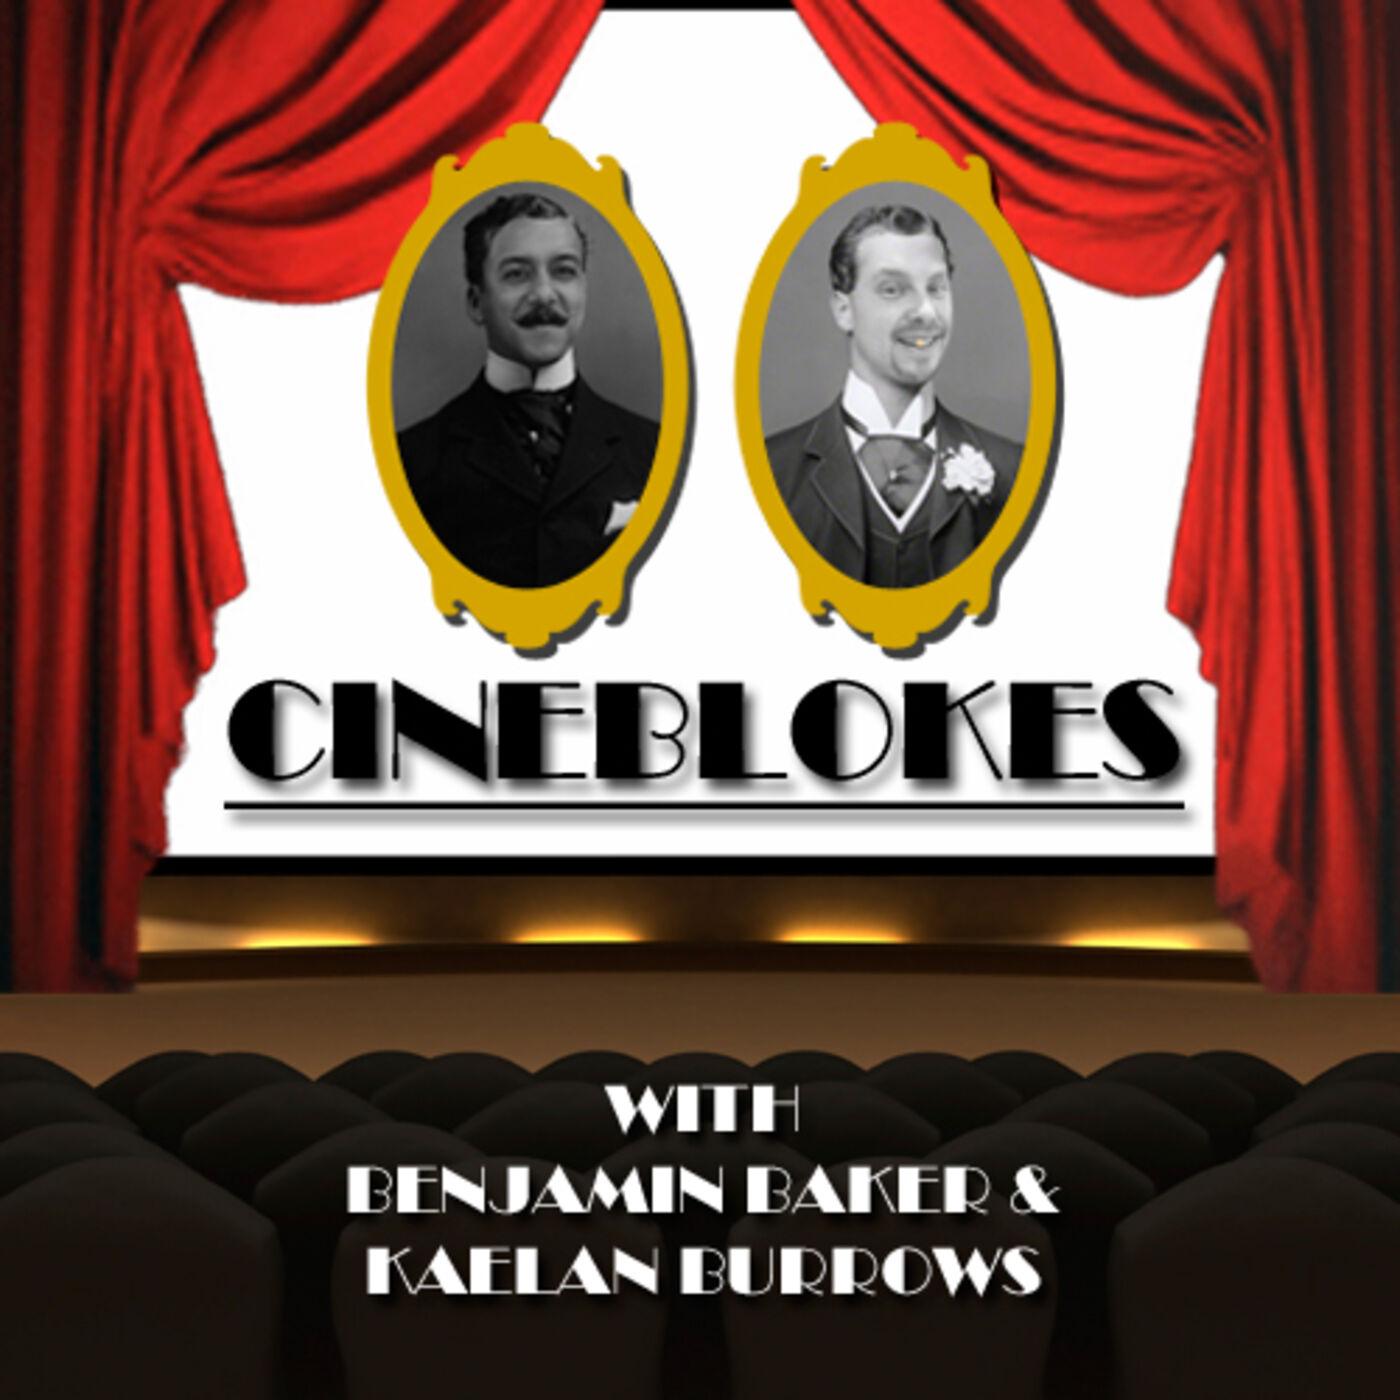 Cineblokes Episode 150 - No Time To Die